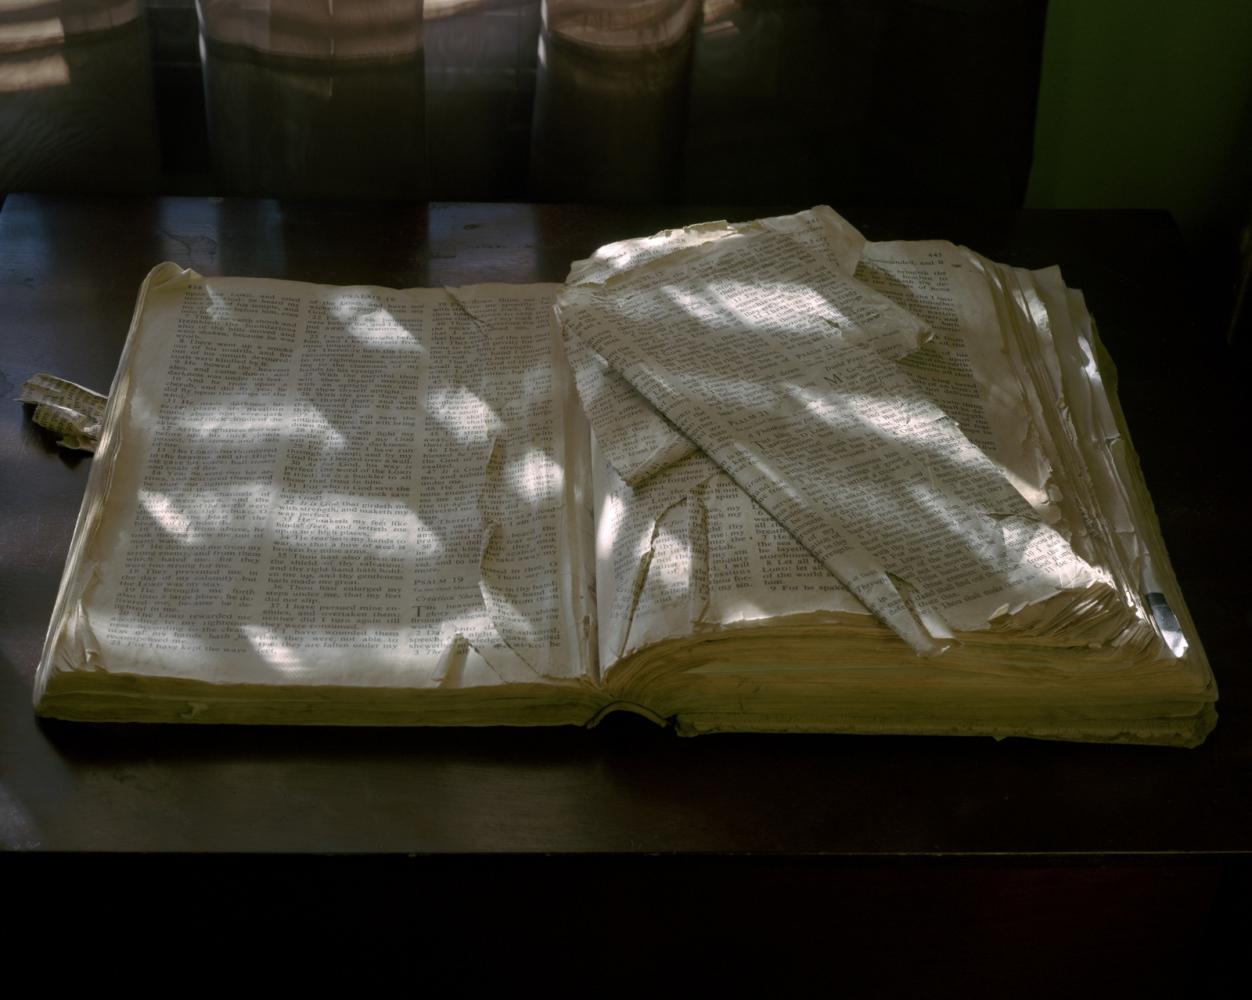 Lorraine's Bible, Dalton, IL 2014